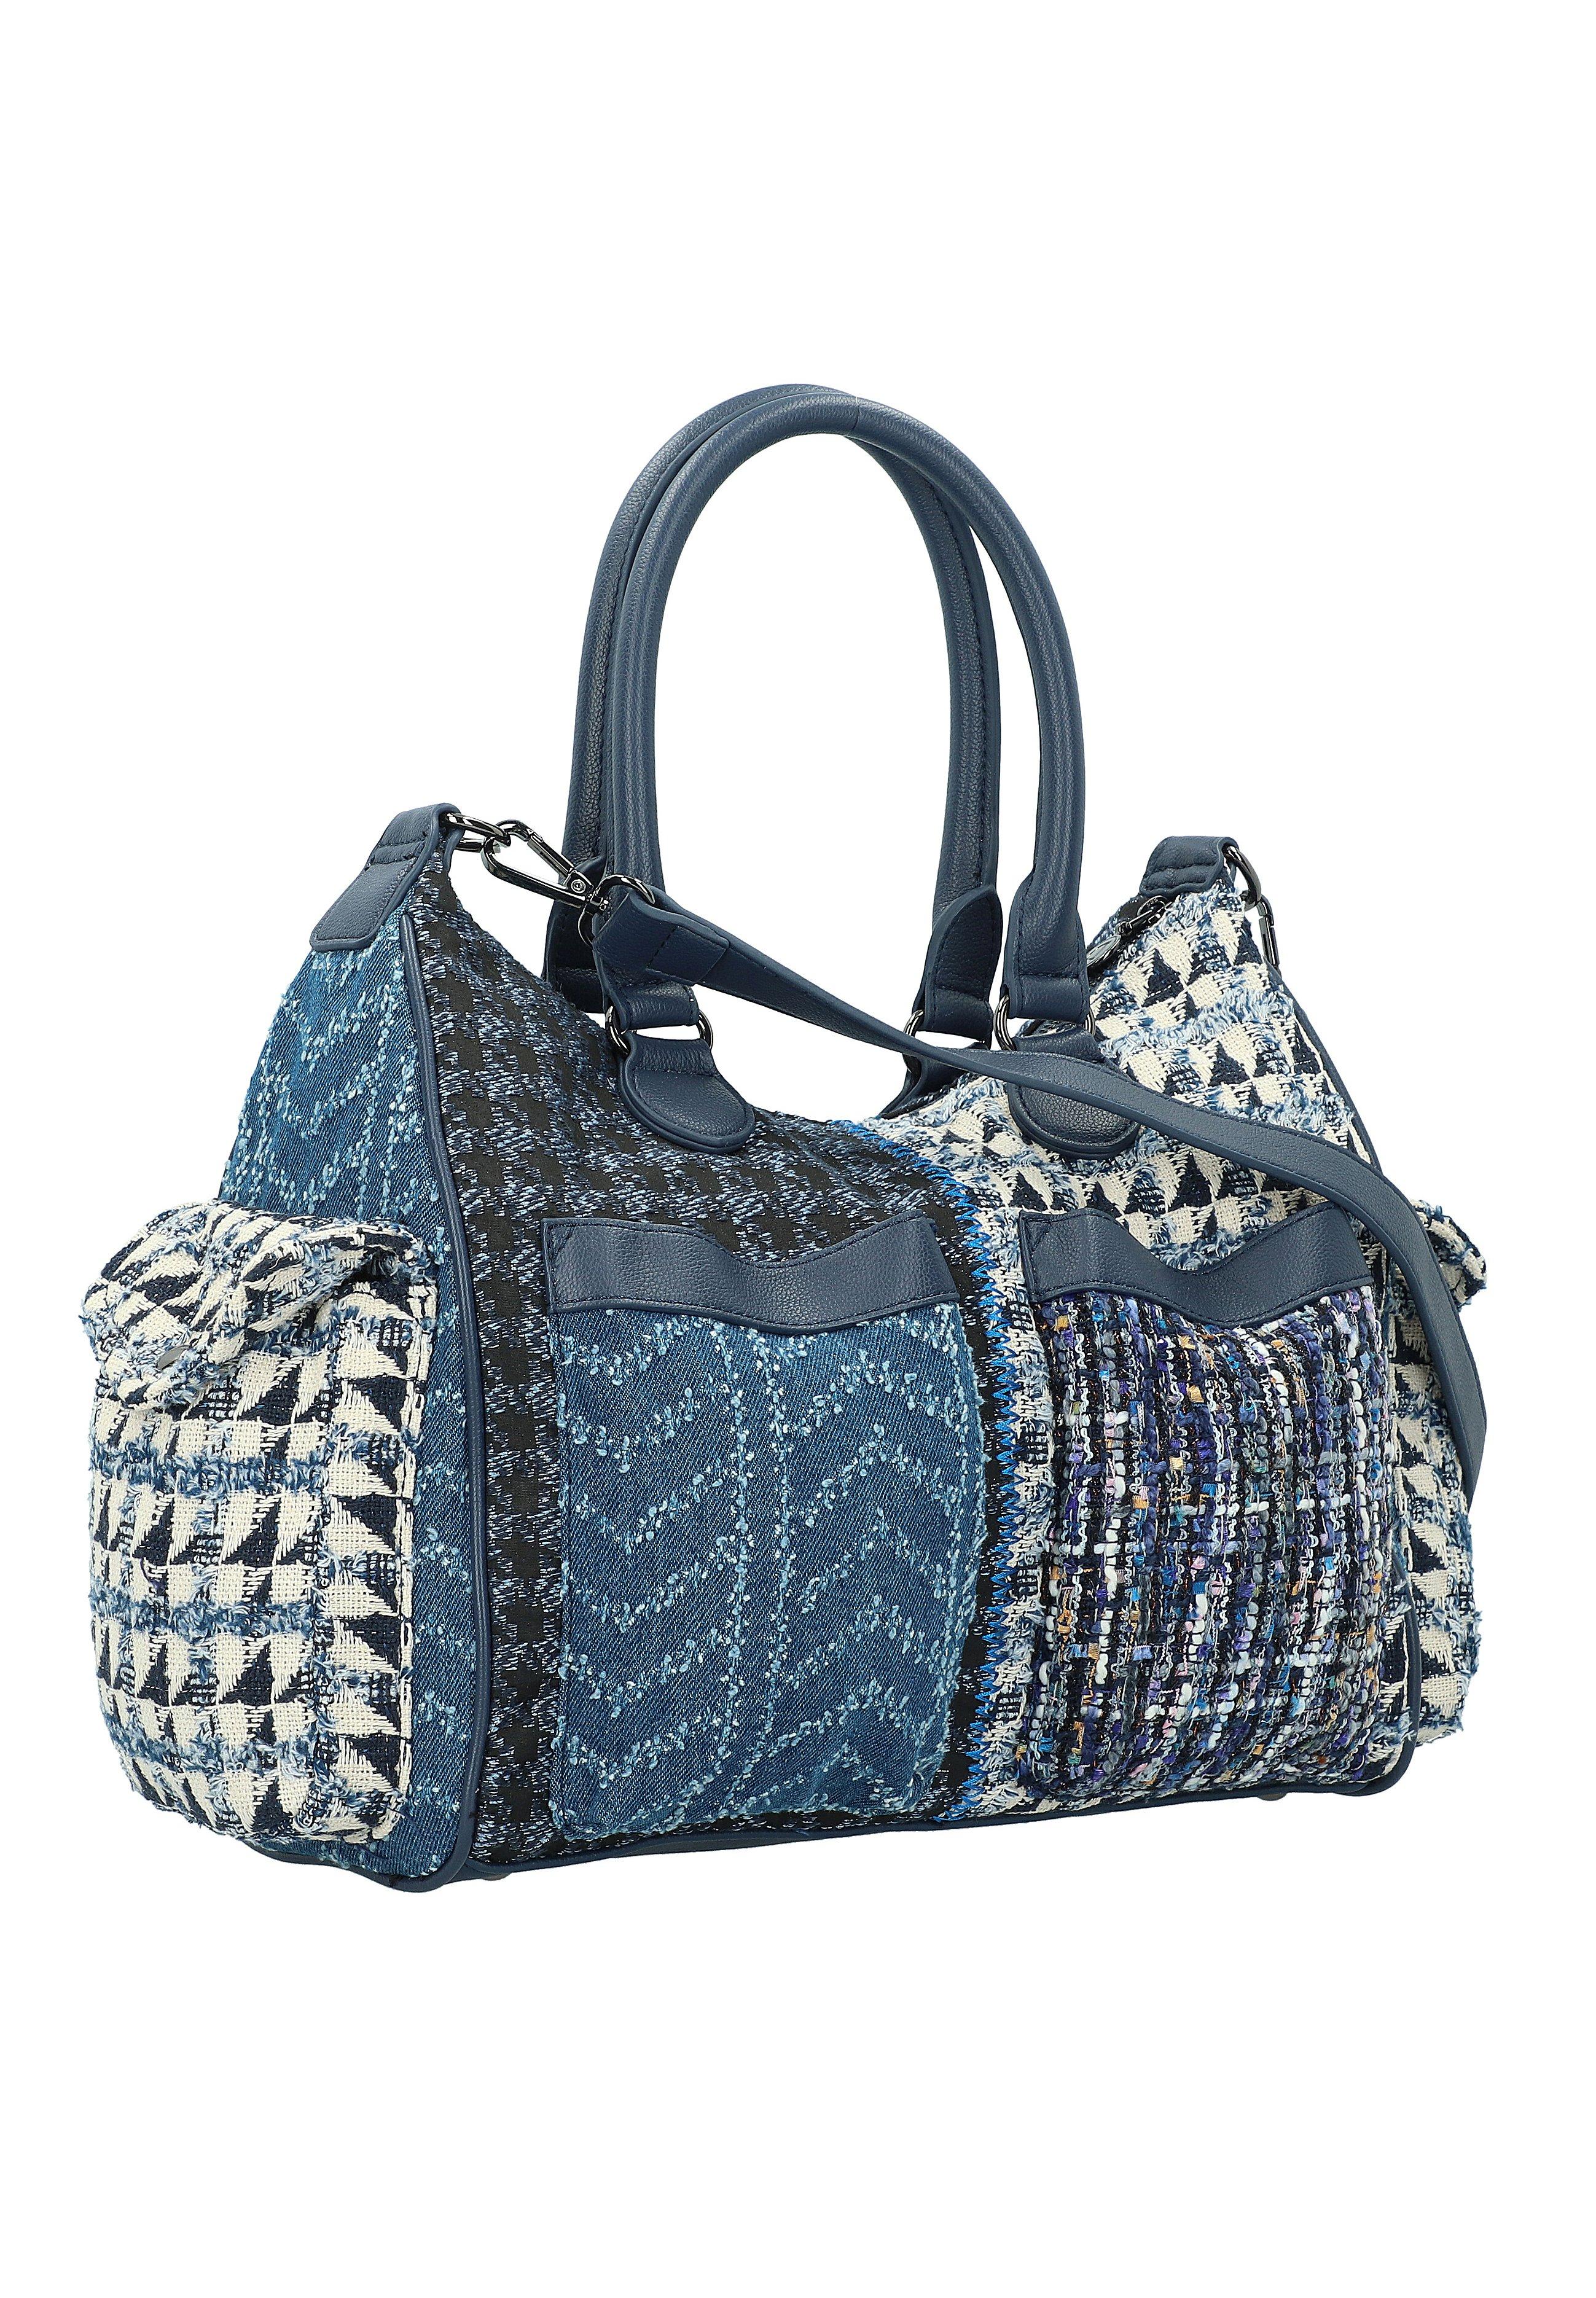 Desigual Bols New 1968 London - Shopping Bag Medieval Blue/blau